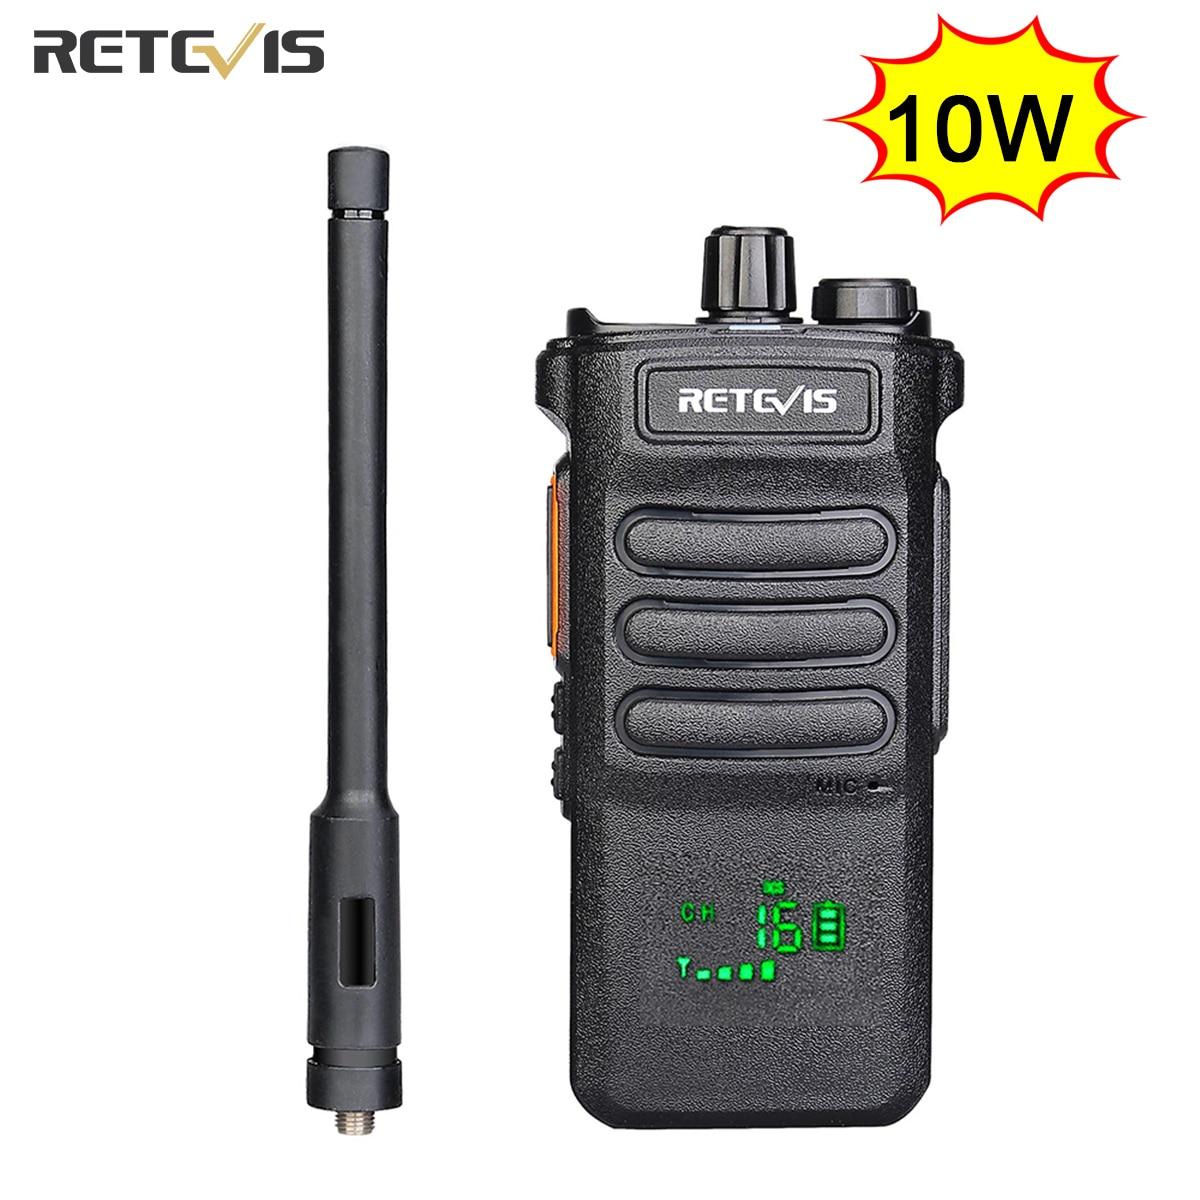 aliexpress.com - 10W Retevis Walkie Talkie Long Range RT86 Walkie-talkies 1 2 pcs Portable Radio For Hunting Powerful walkie-talkie Two-way radio